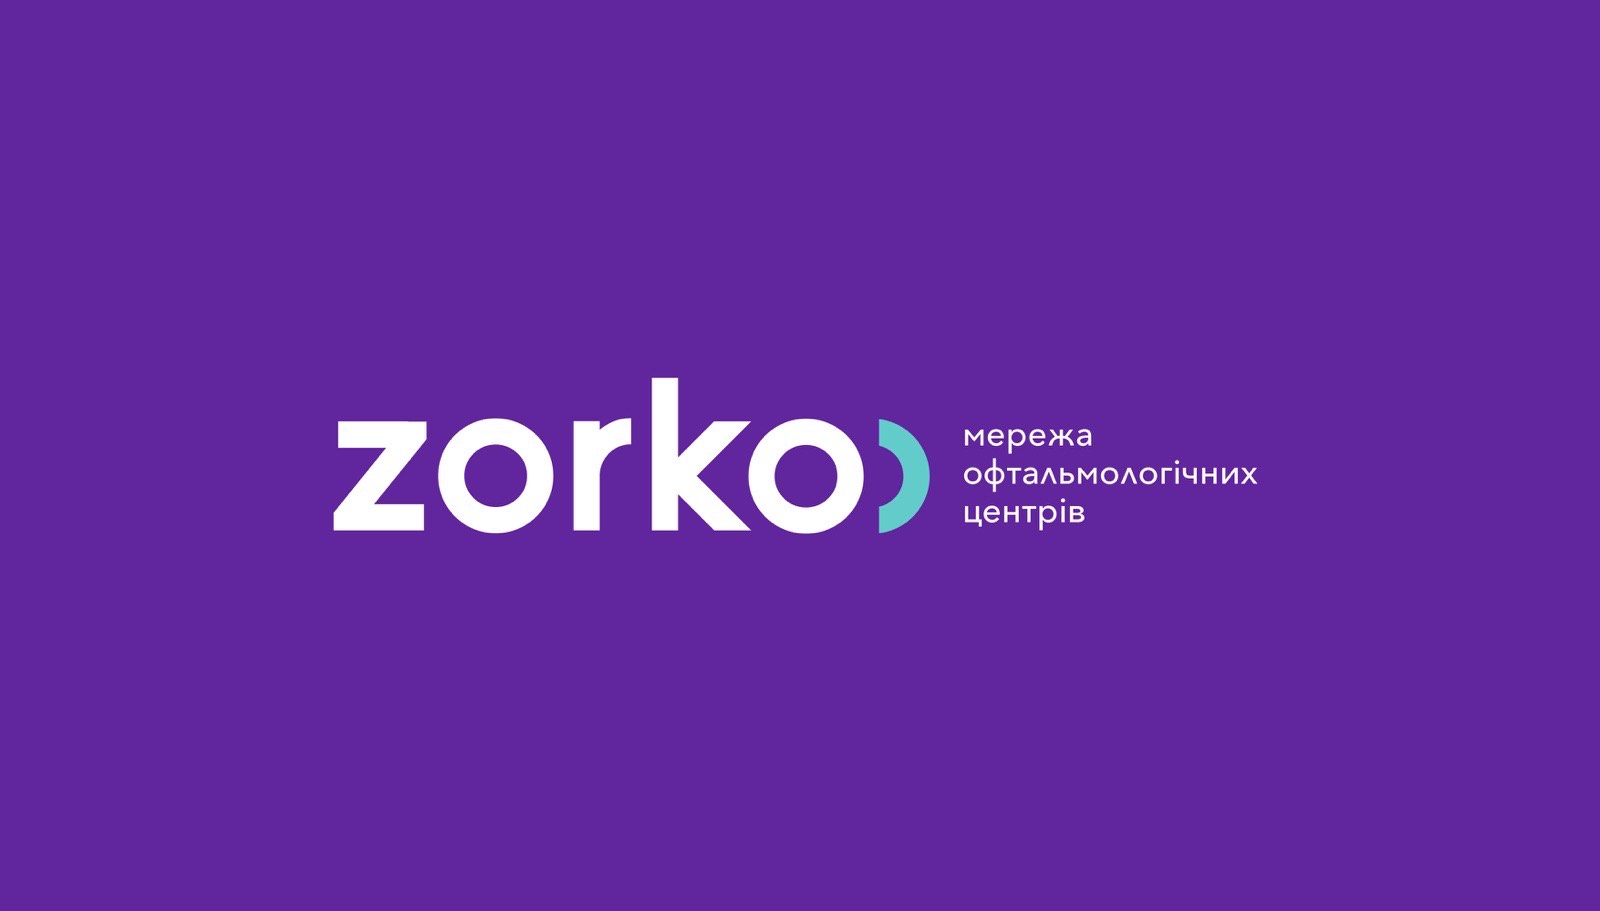 Zorko